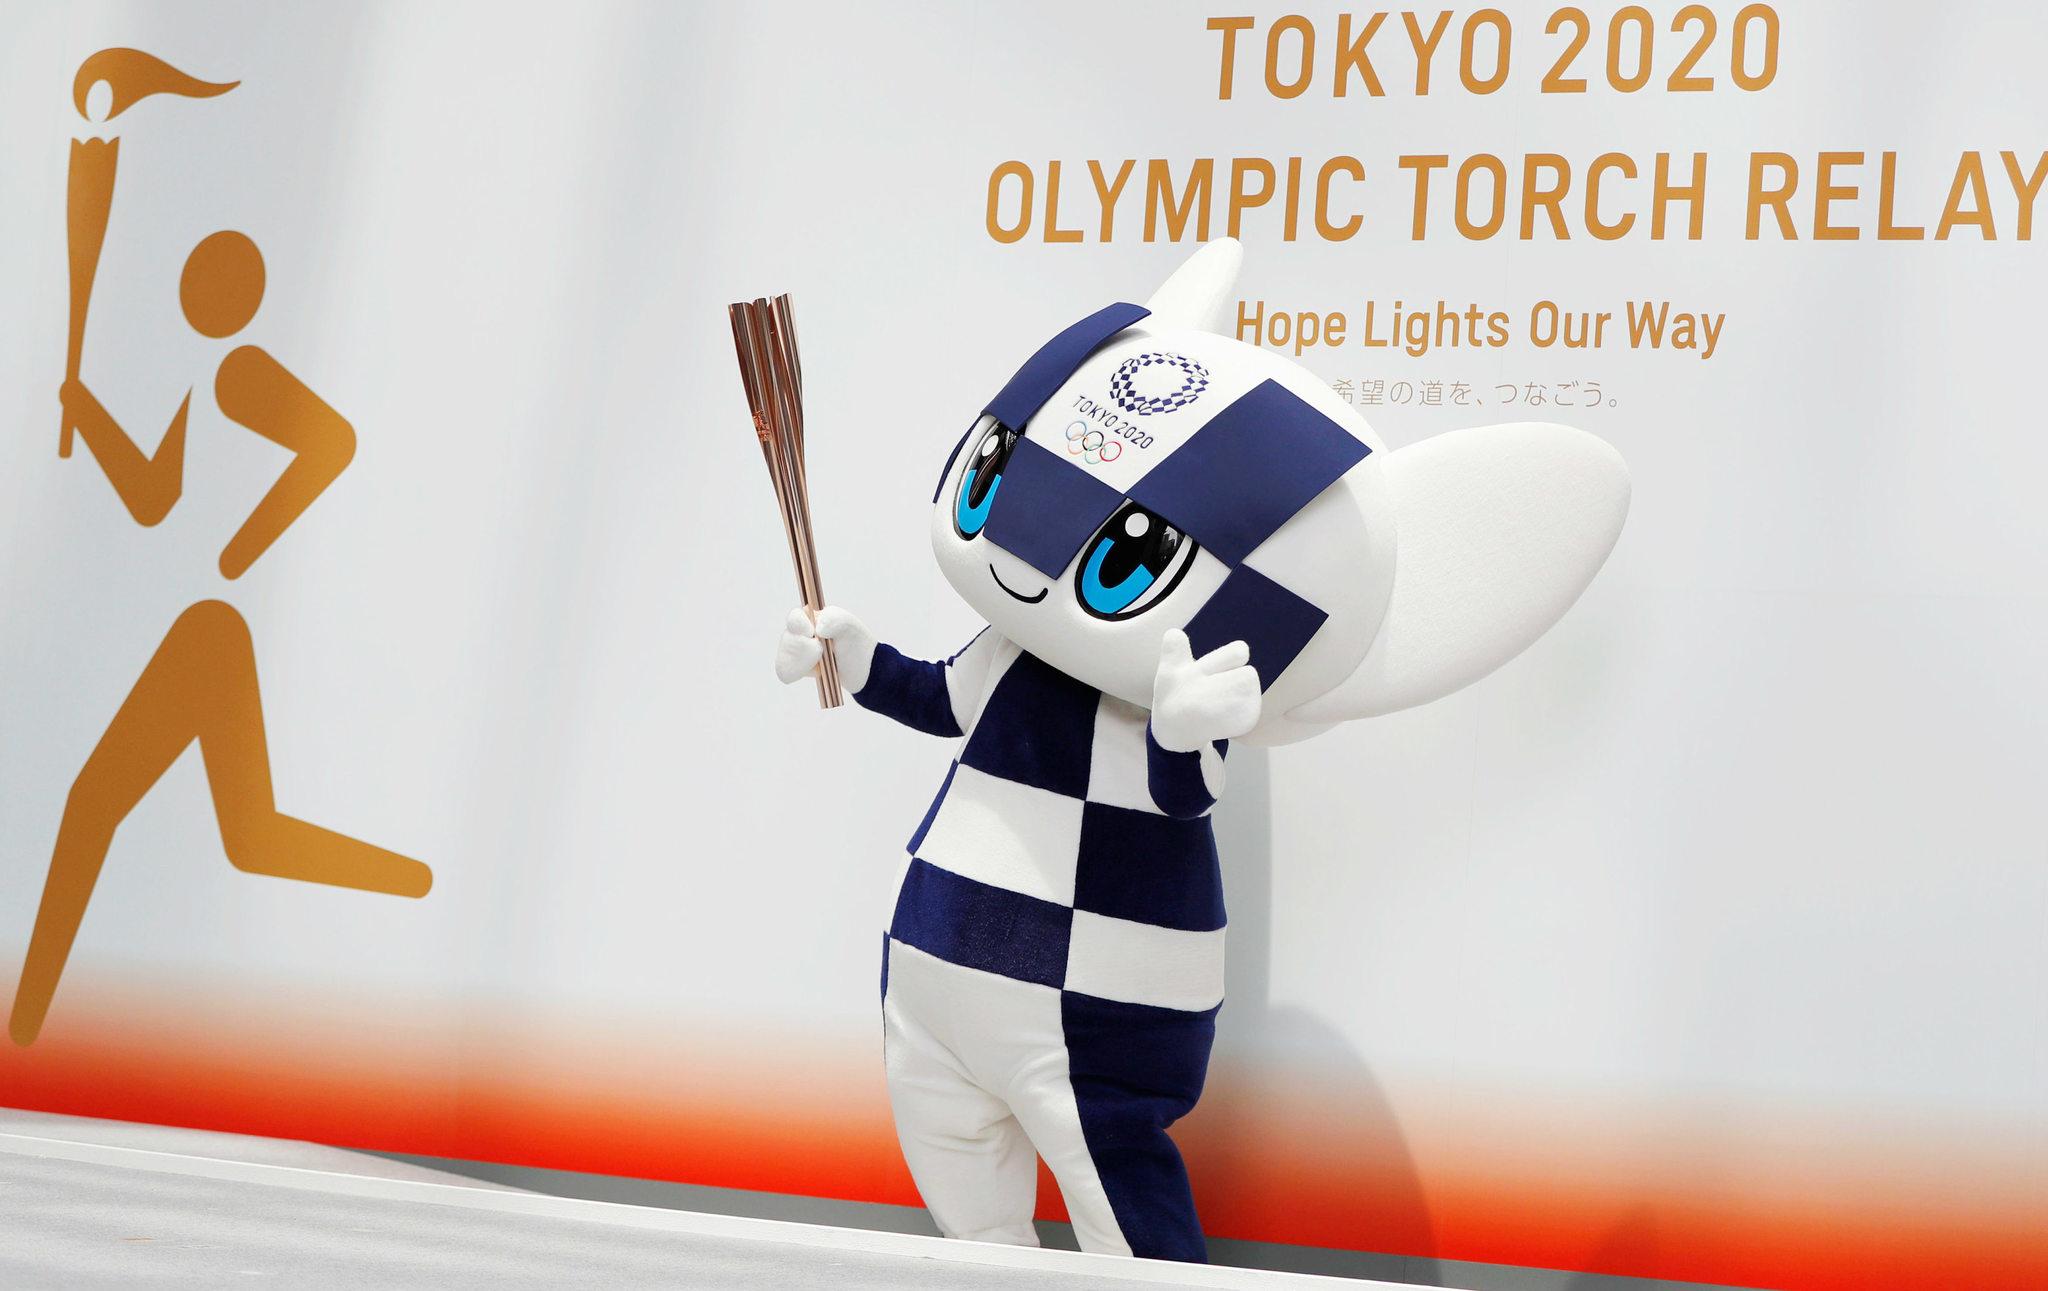 Miraitowa sostiene la Antorcha de Tokyo 2020